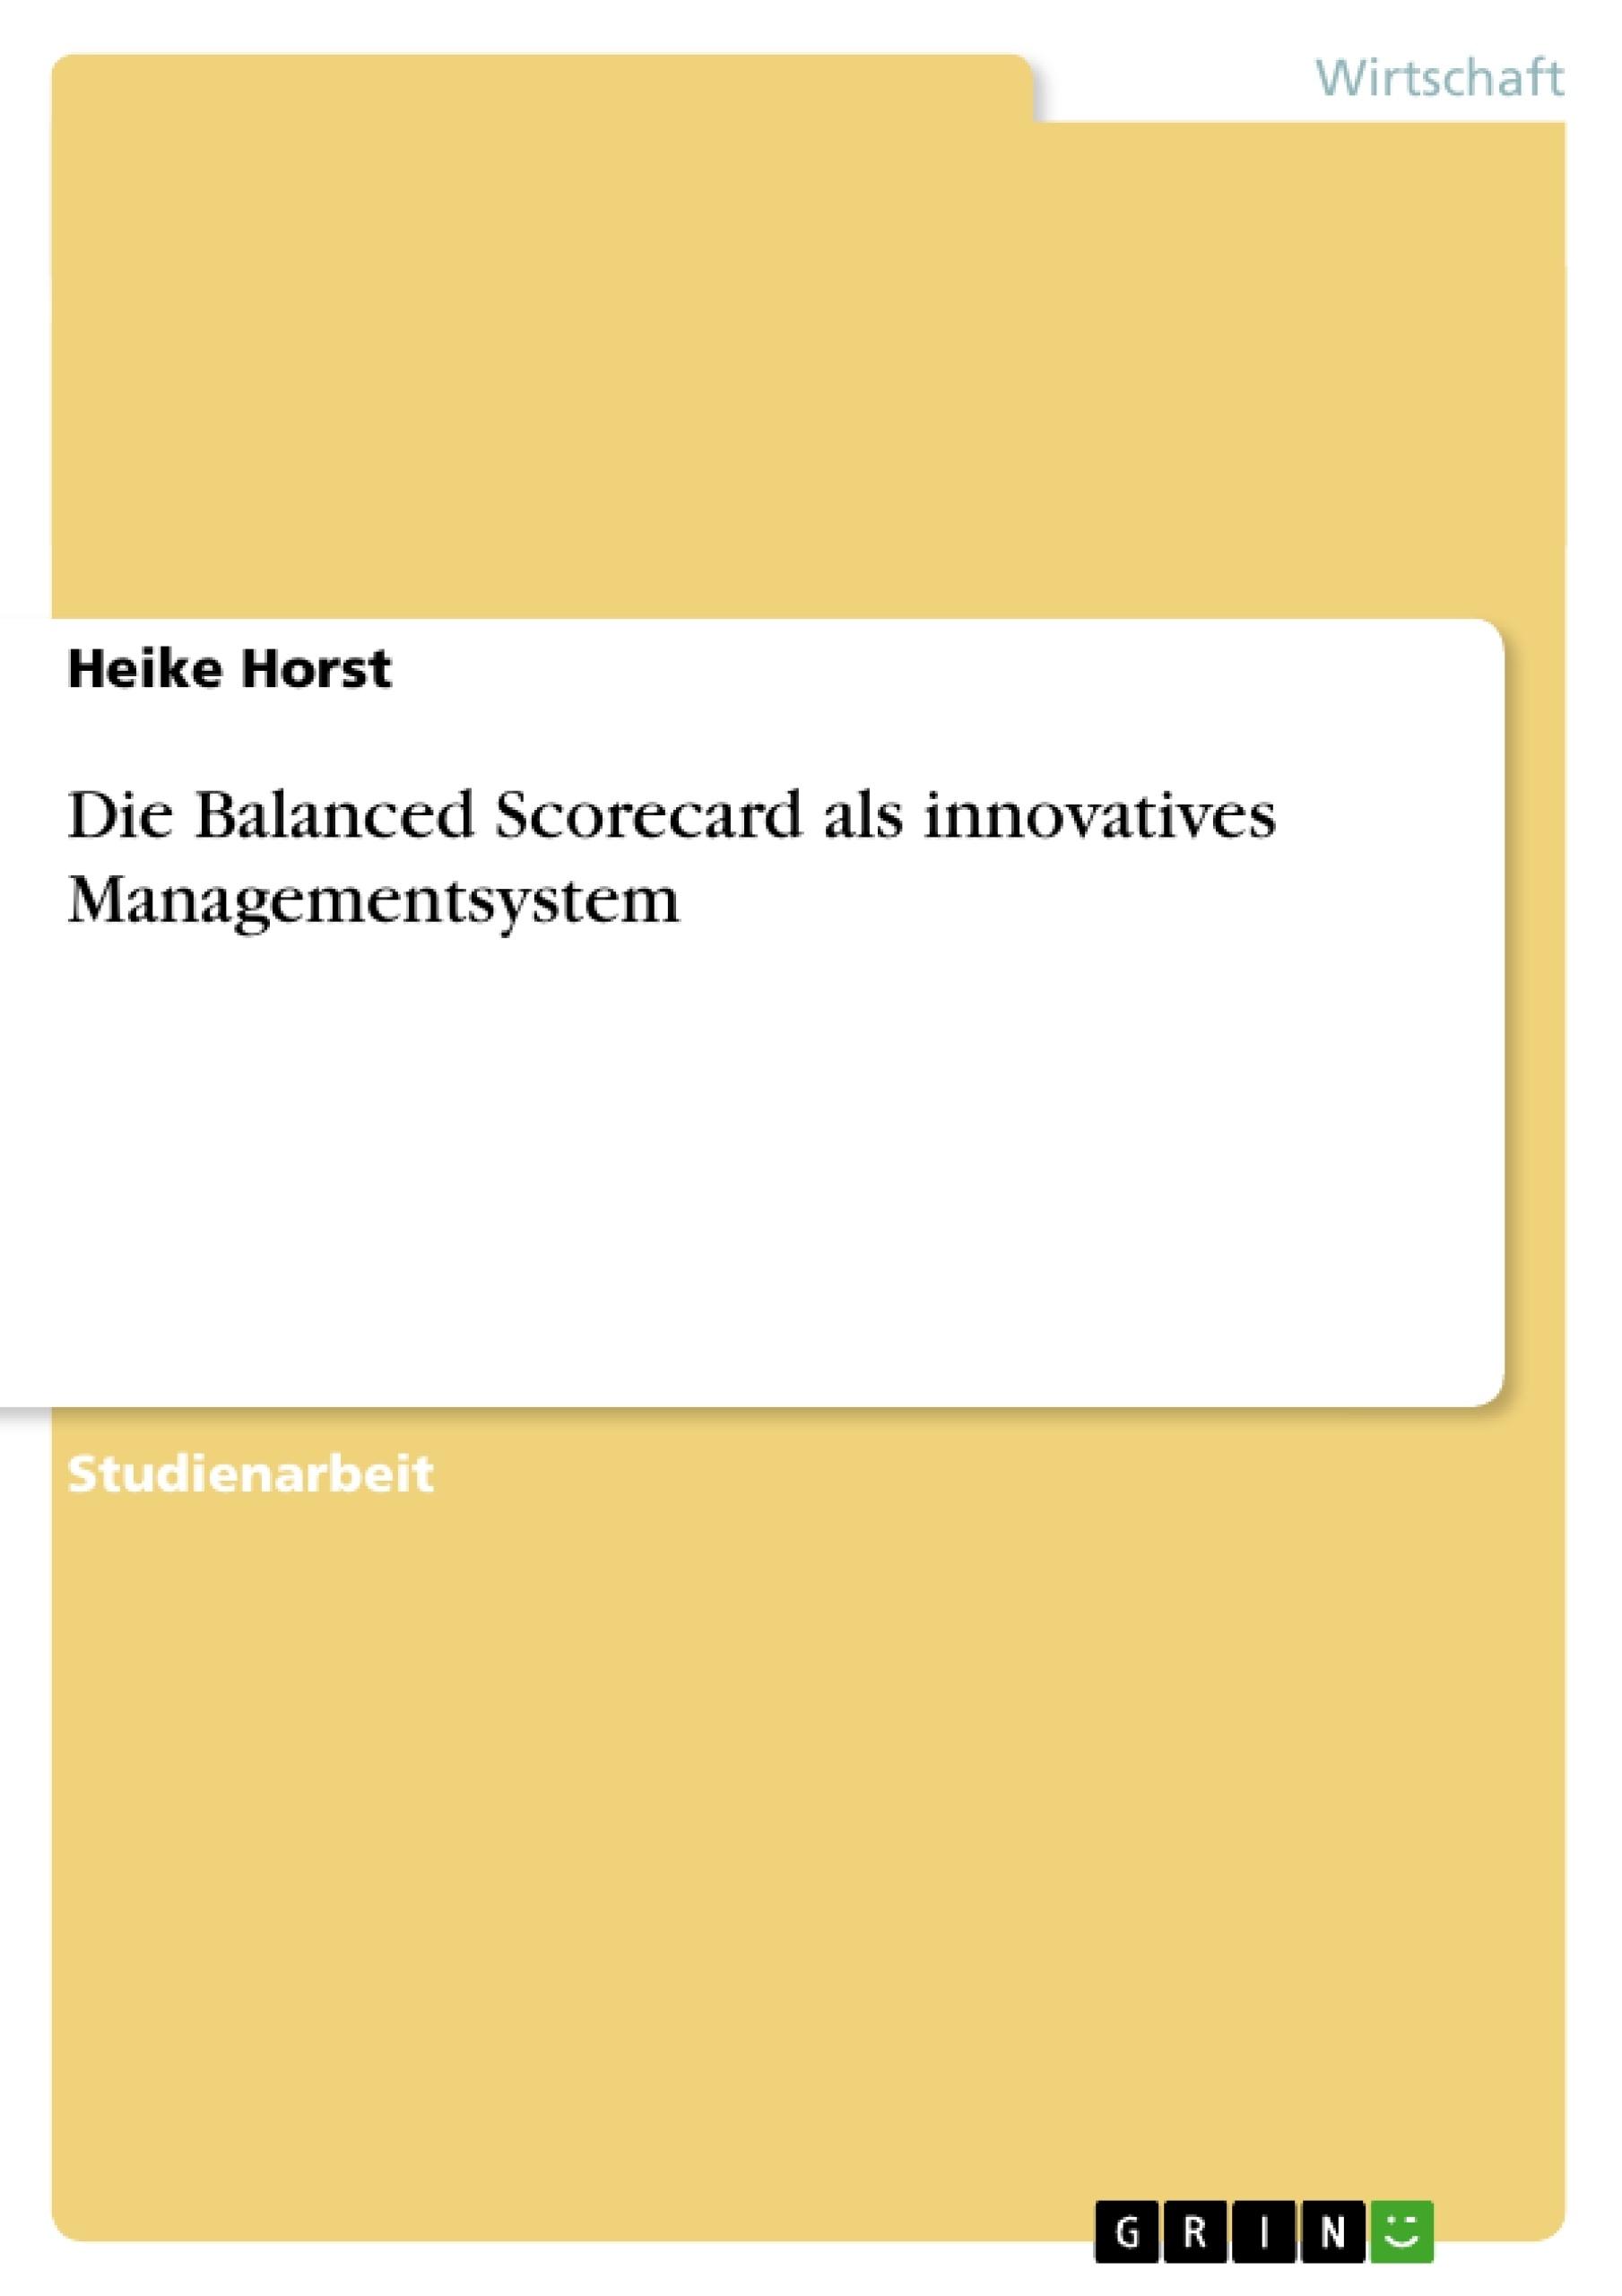 Titel: Die Balanced Scorecard als innovatives Managementsystem